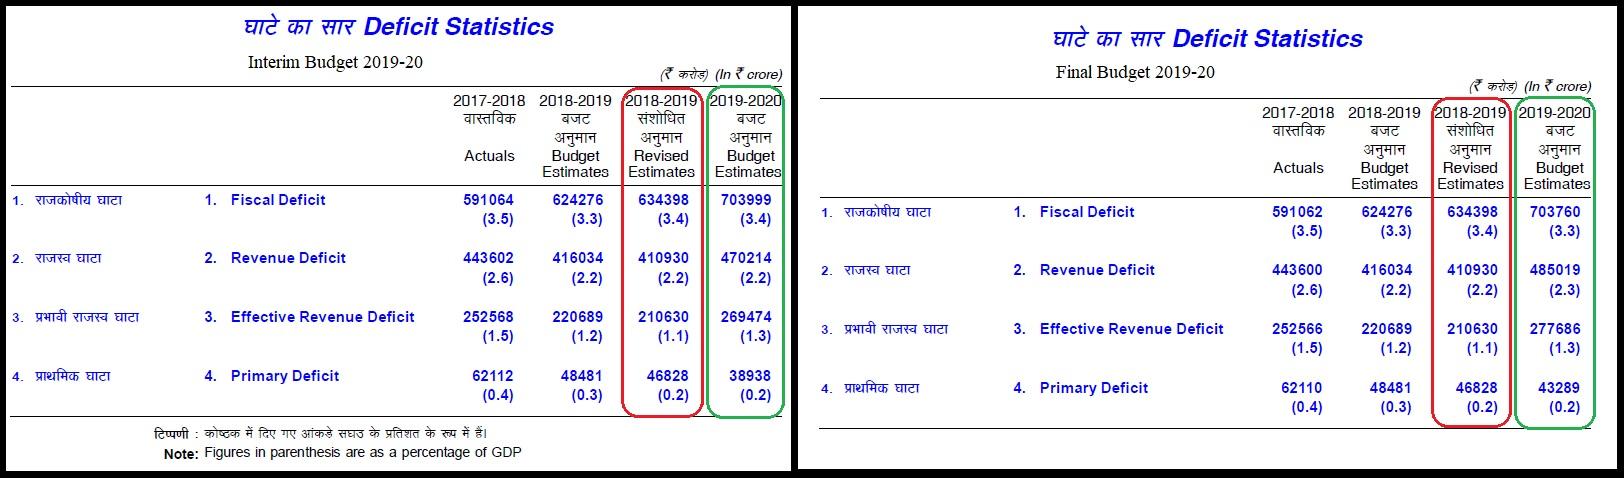 Table 2 Comparison of Deficit Statistics between Interim and Final Budgets 2019-20